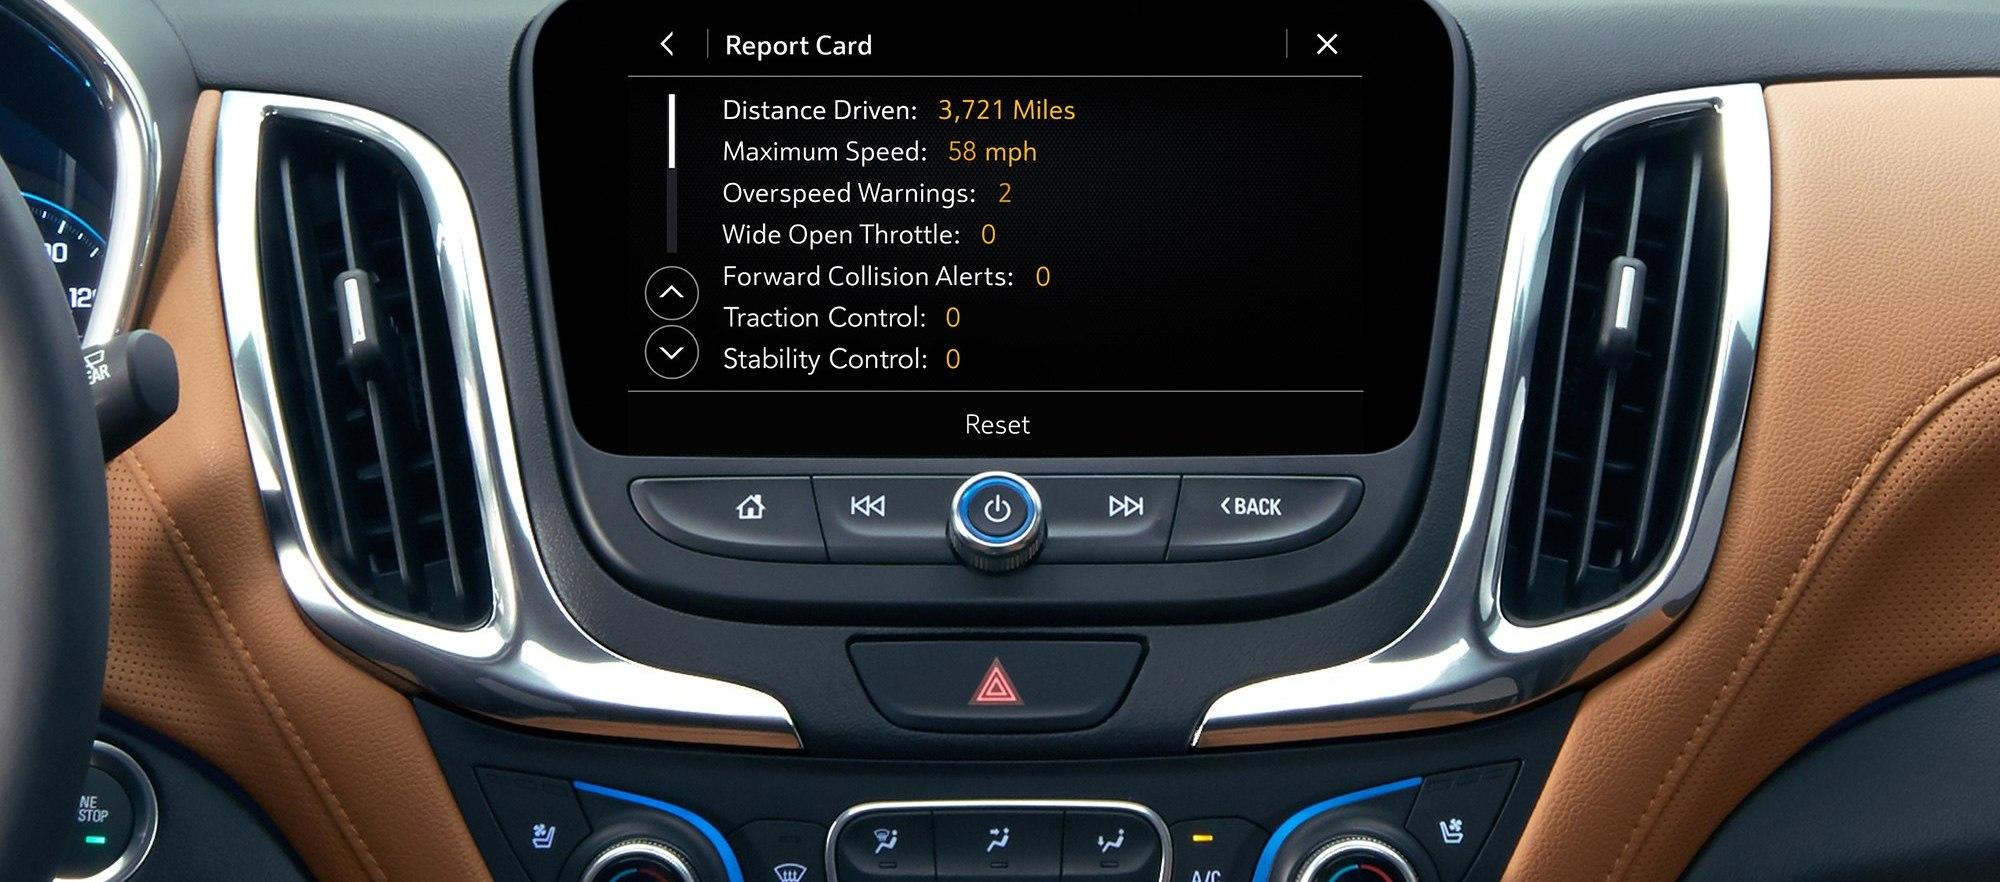 2020 Chevrolet Equinox Touchscreen